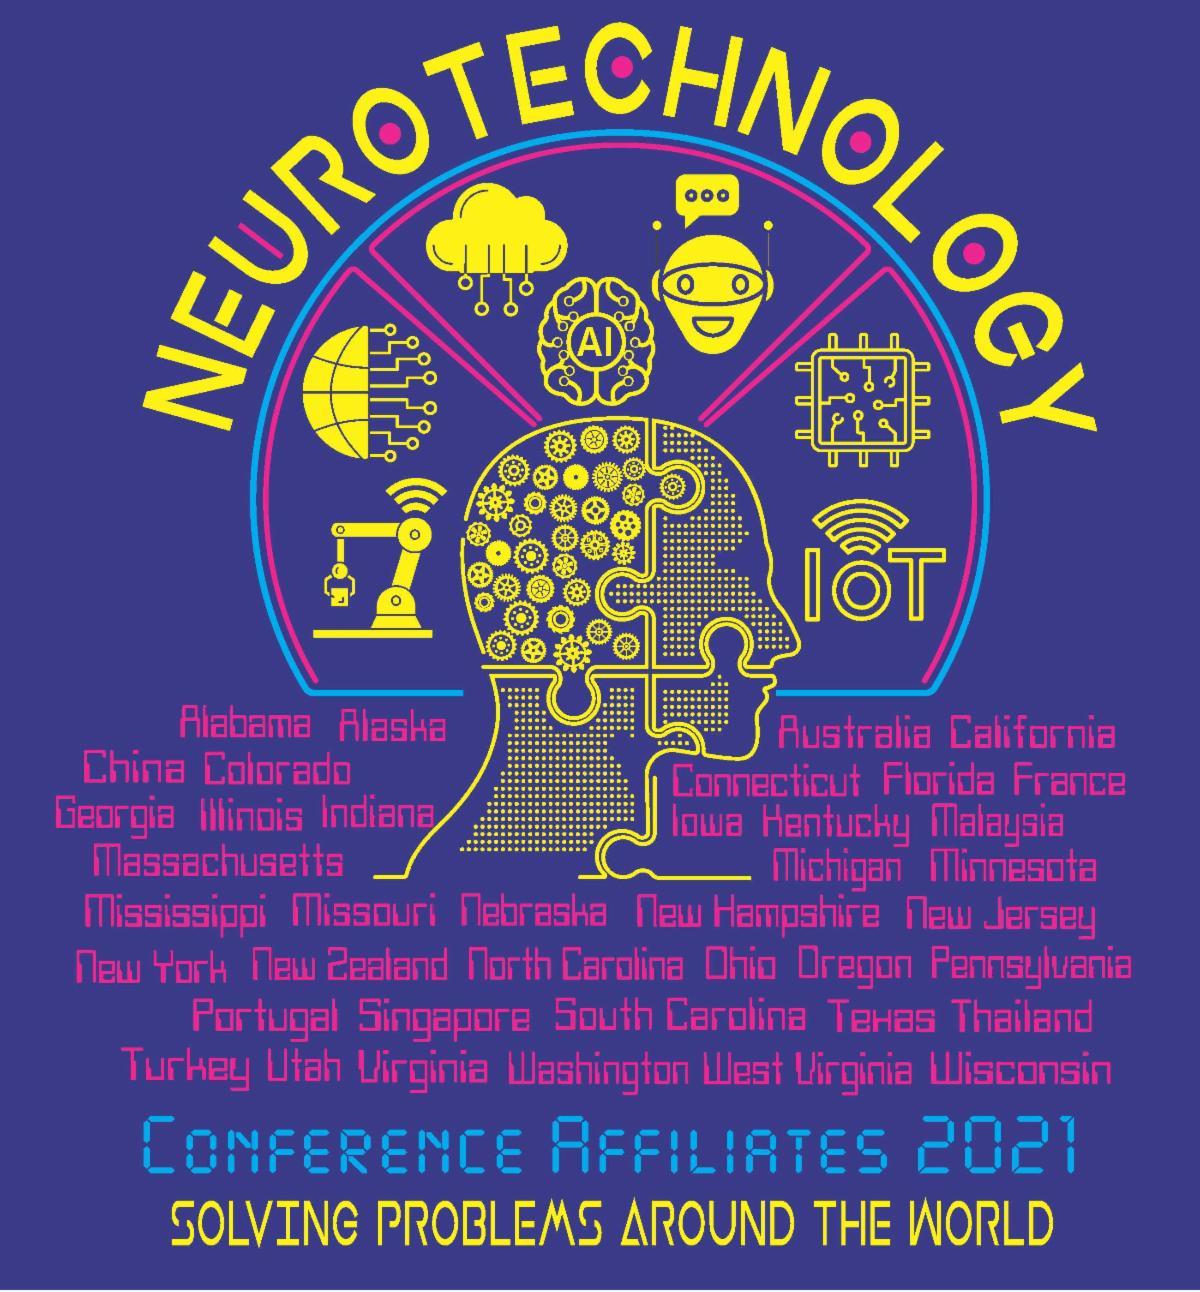 FPS 2021 International Conference Shirt